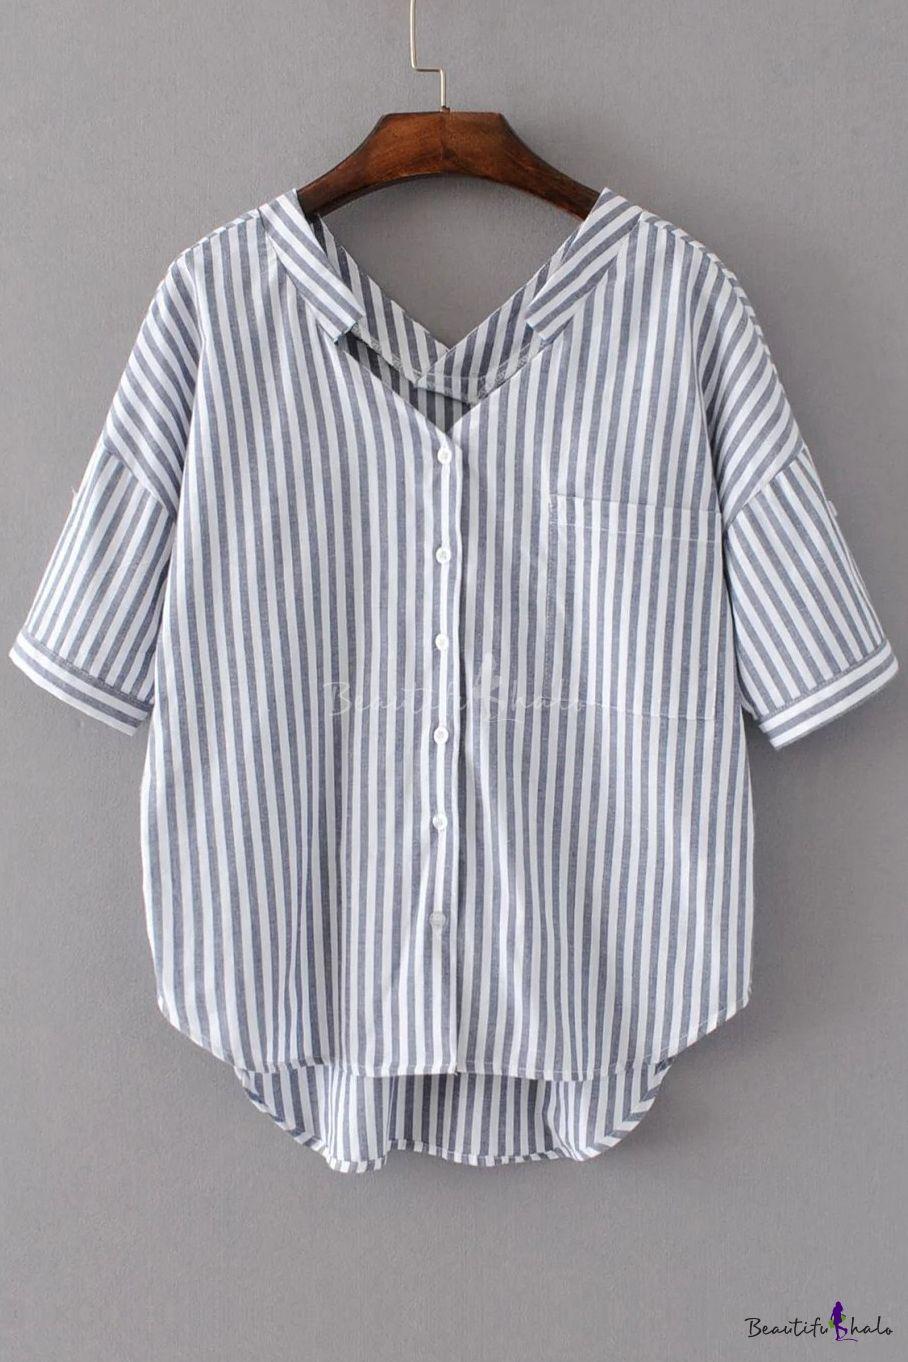 6816181ef9c1cc Vertical Striped Color Block V-Neck Dropped Short Sleeve High Low Hem  Button Down Shirt